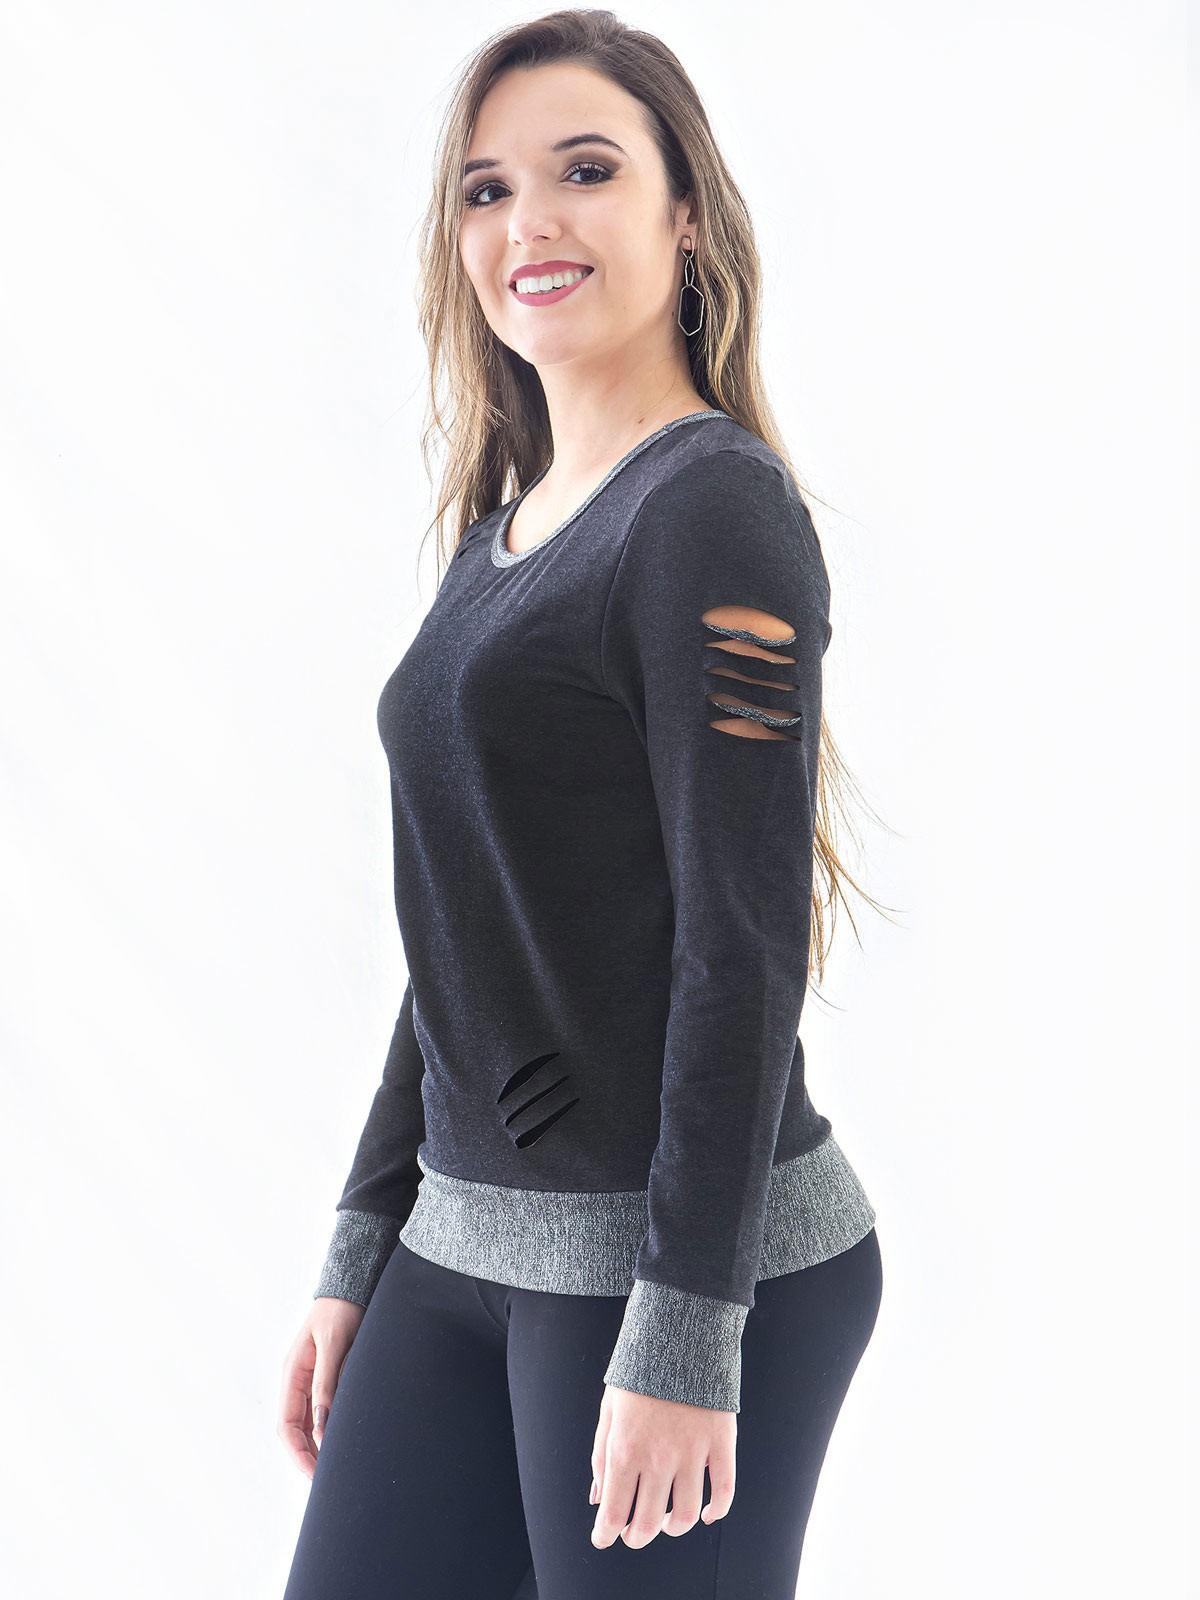 Blusa Moletom Feminina Corte Laser Gola Careca Preta